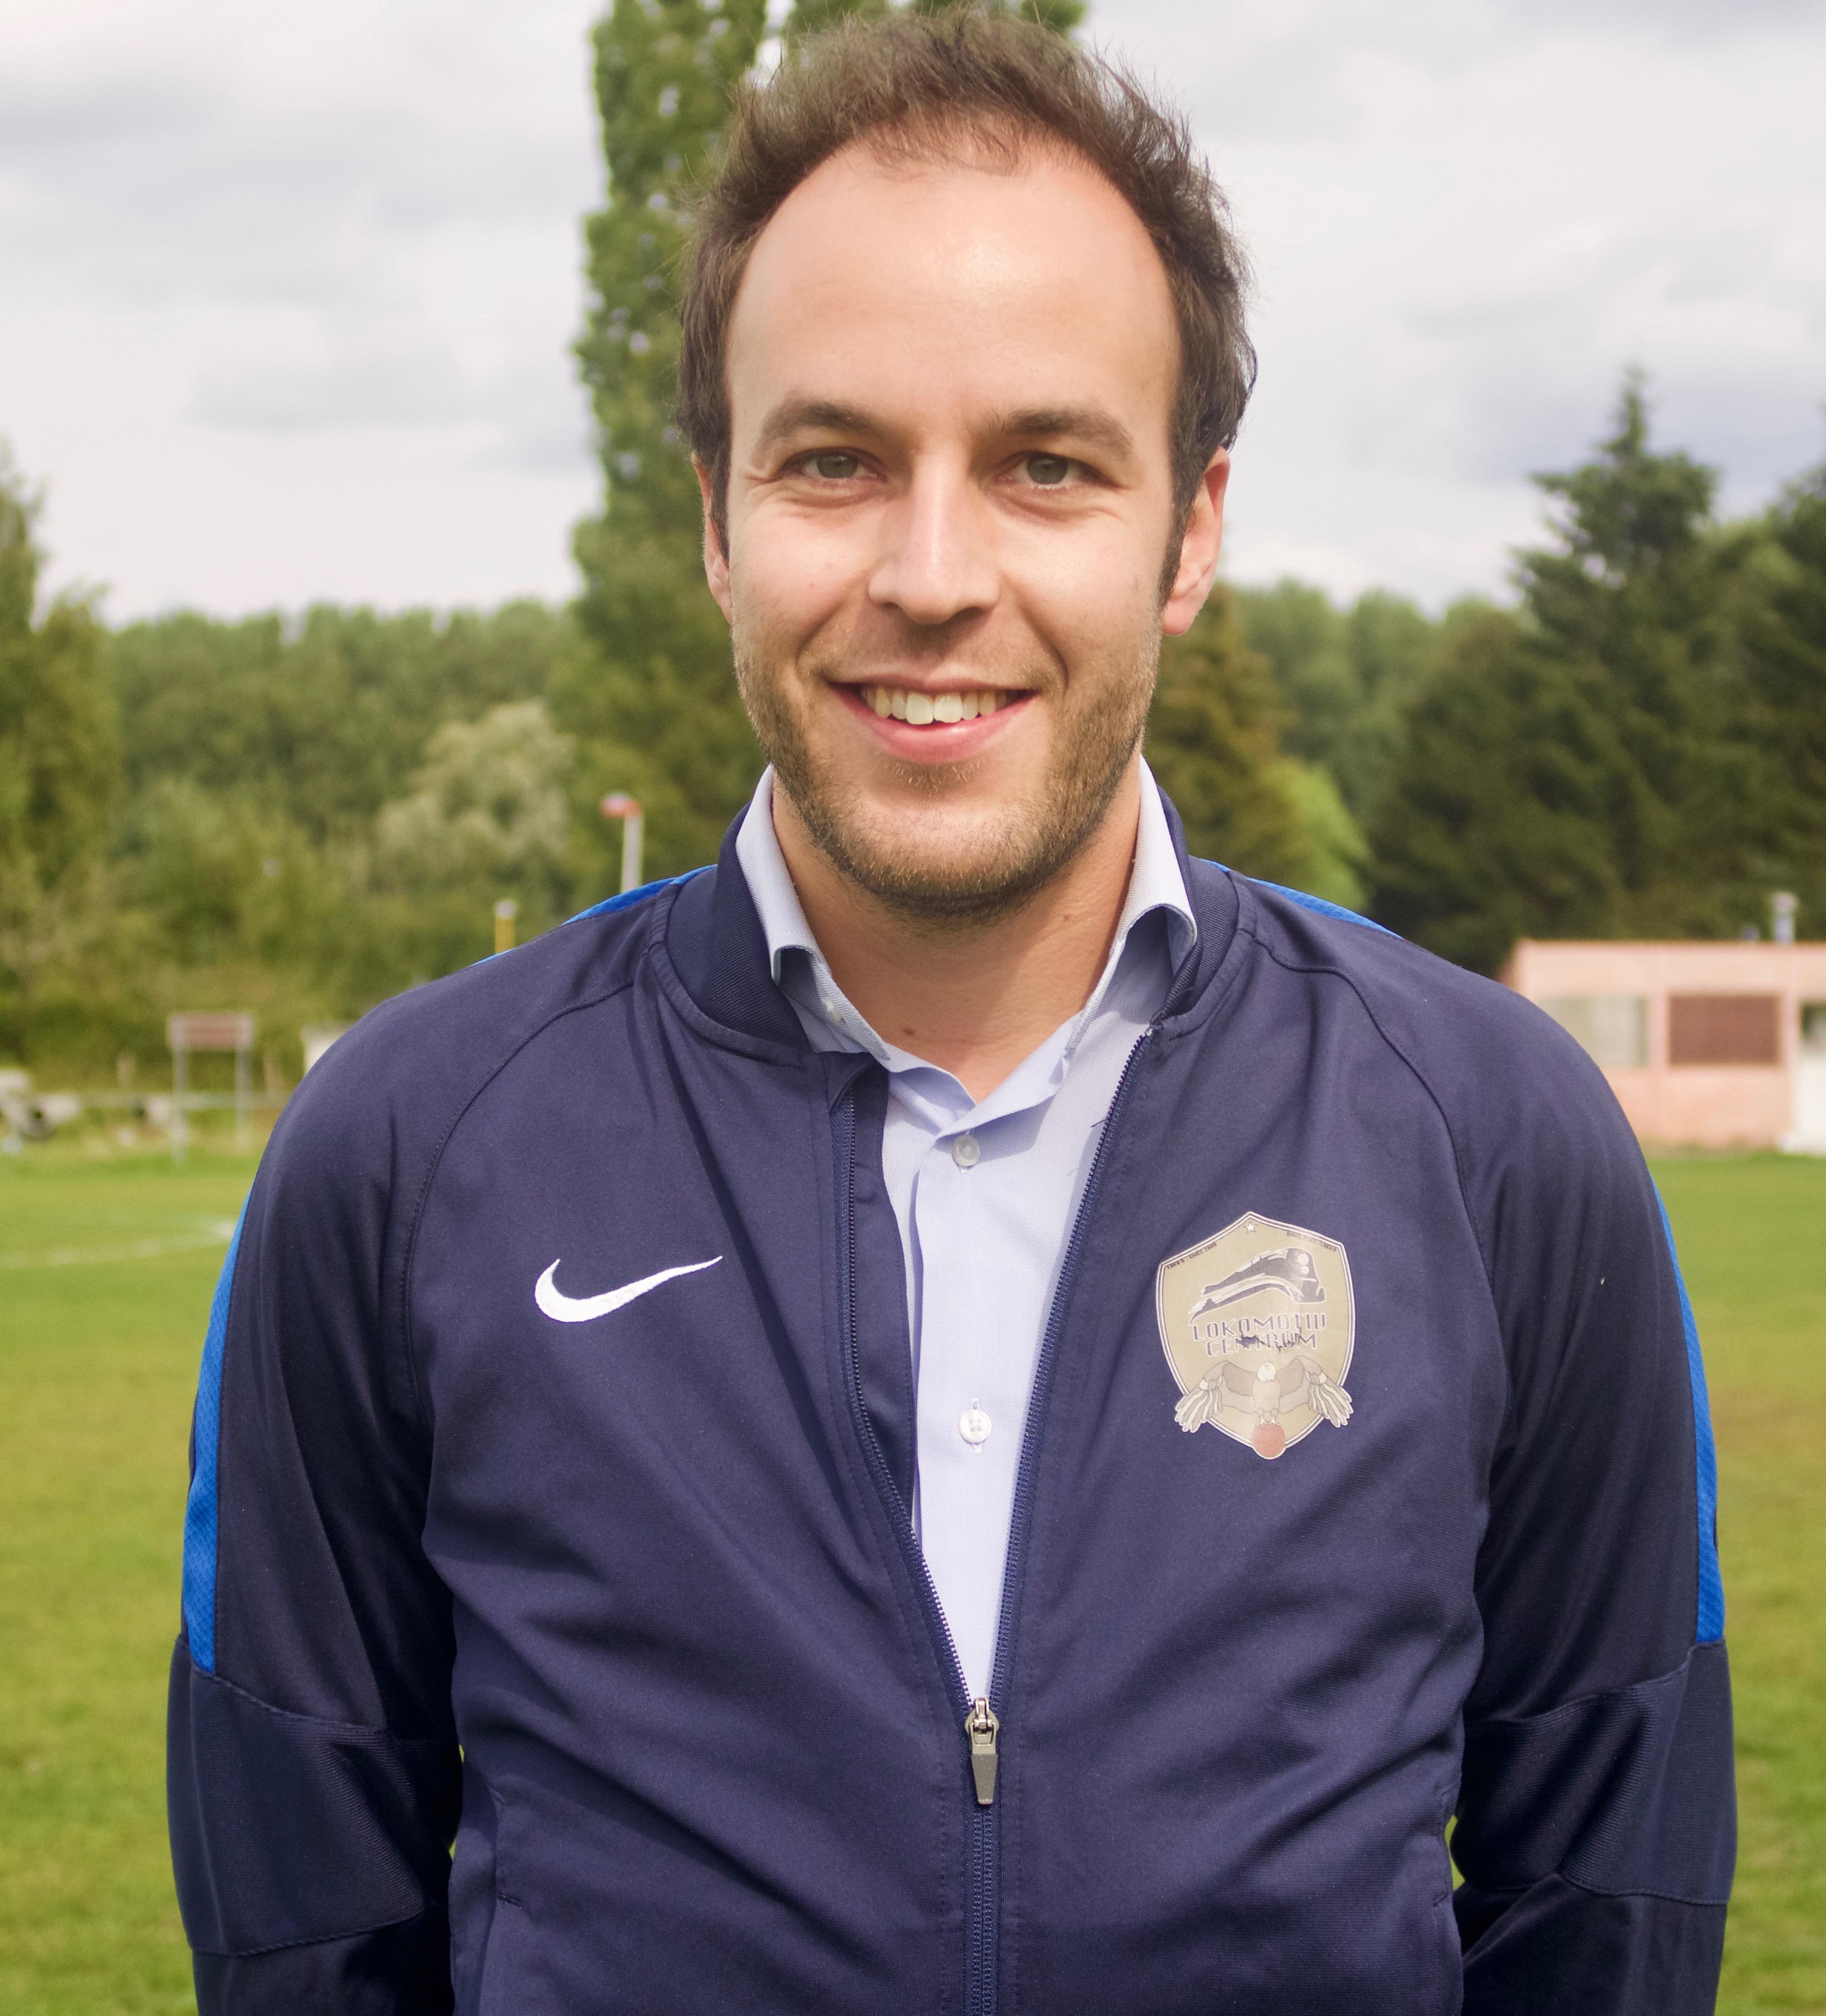 Jeroen De Smedt : Coach